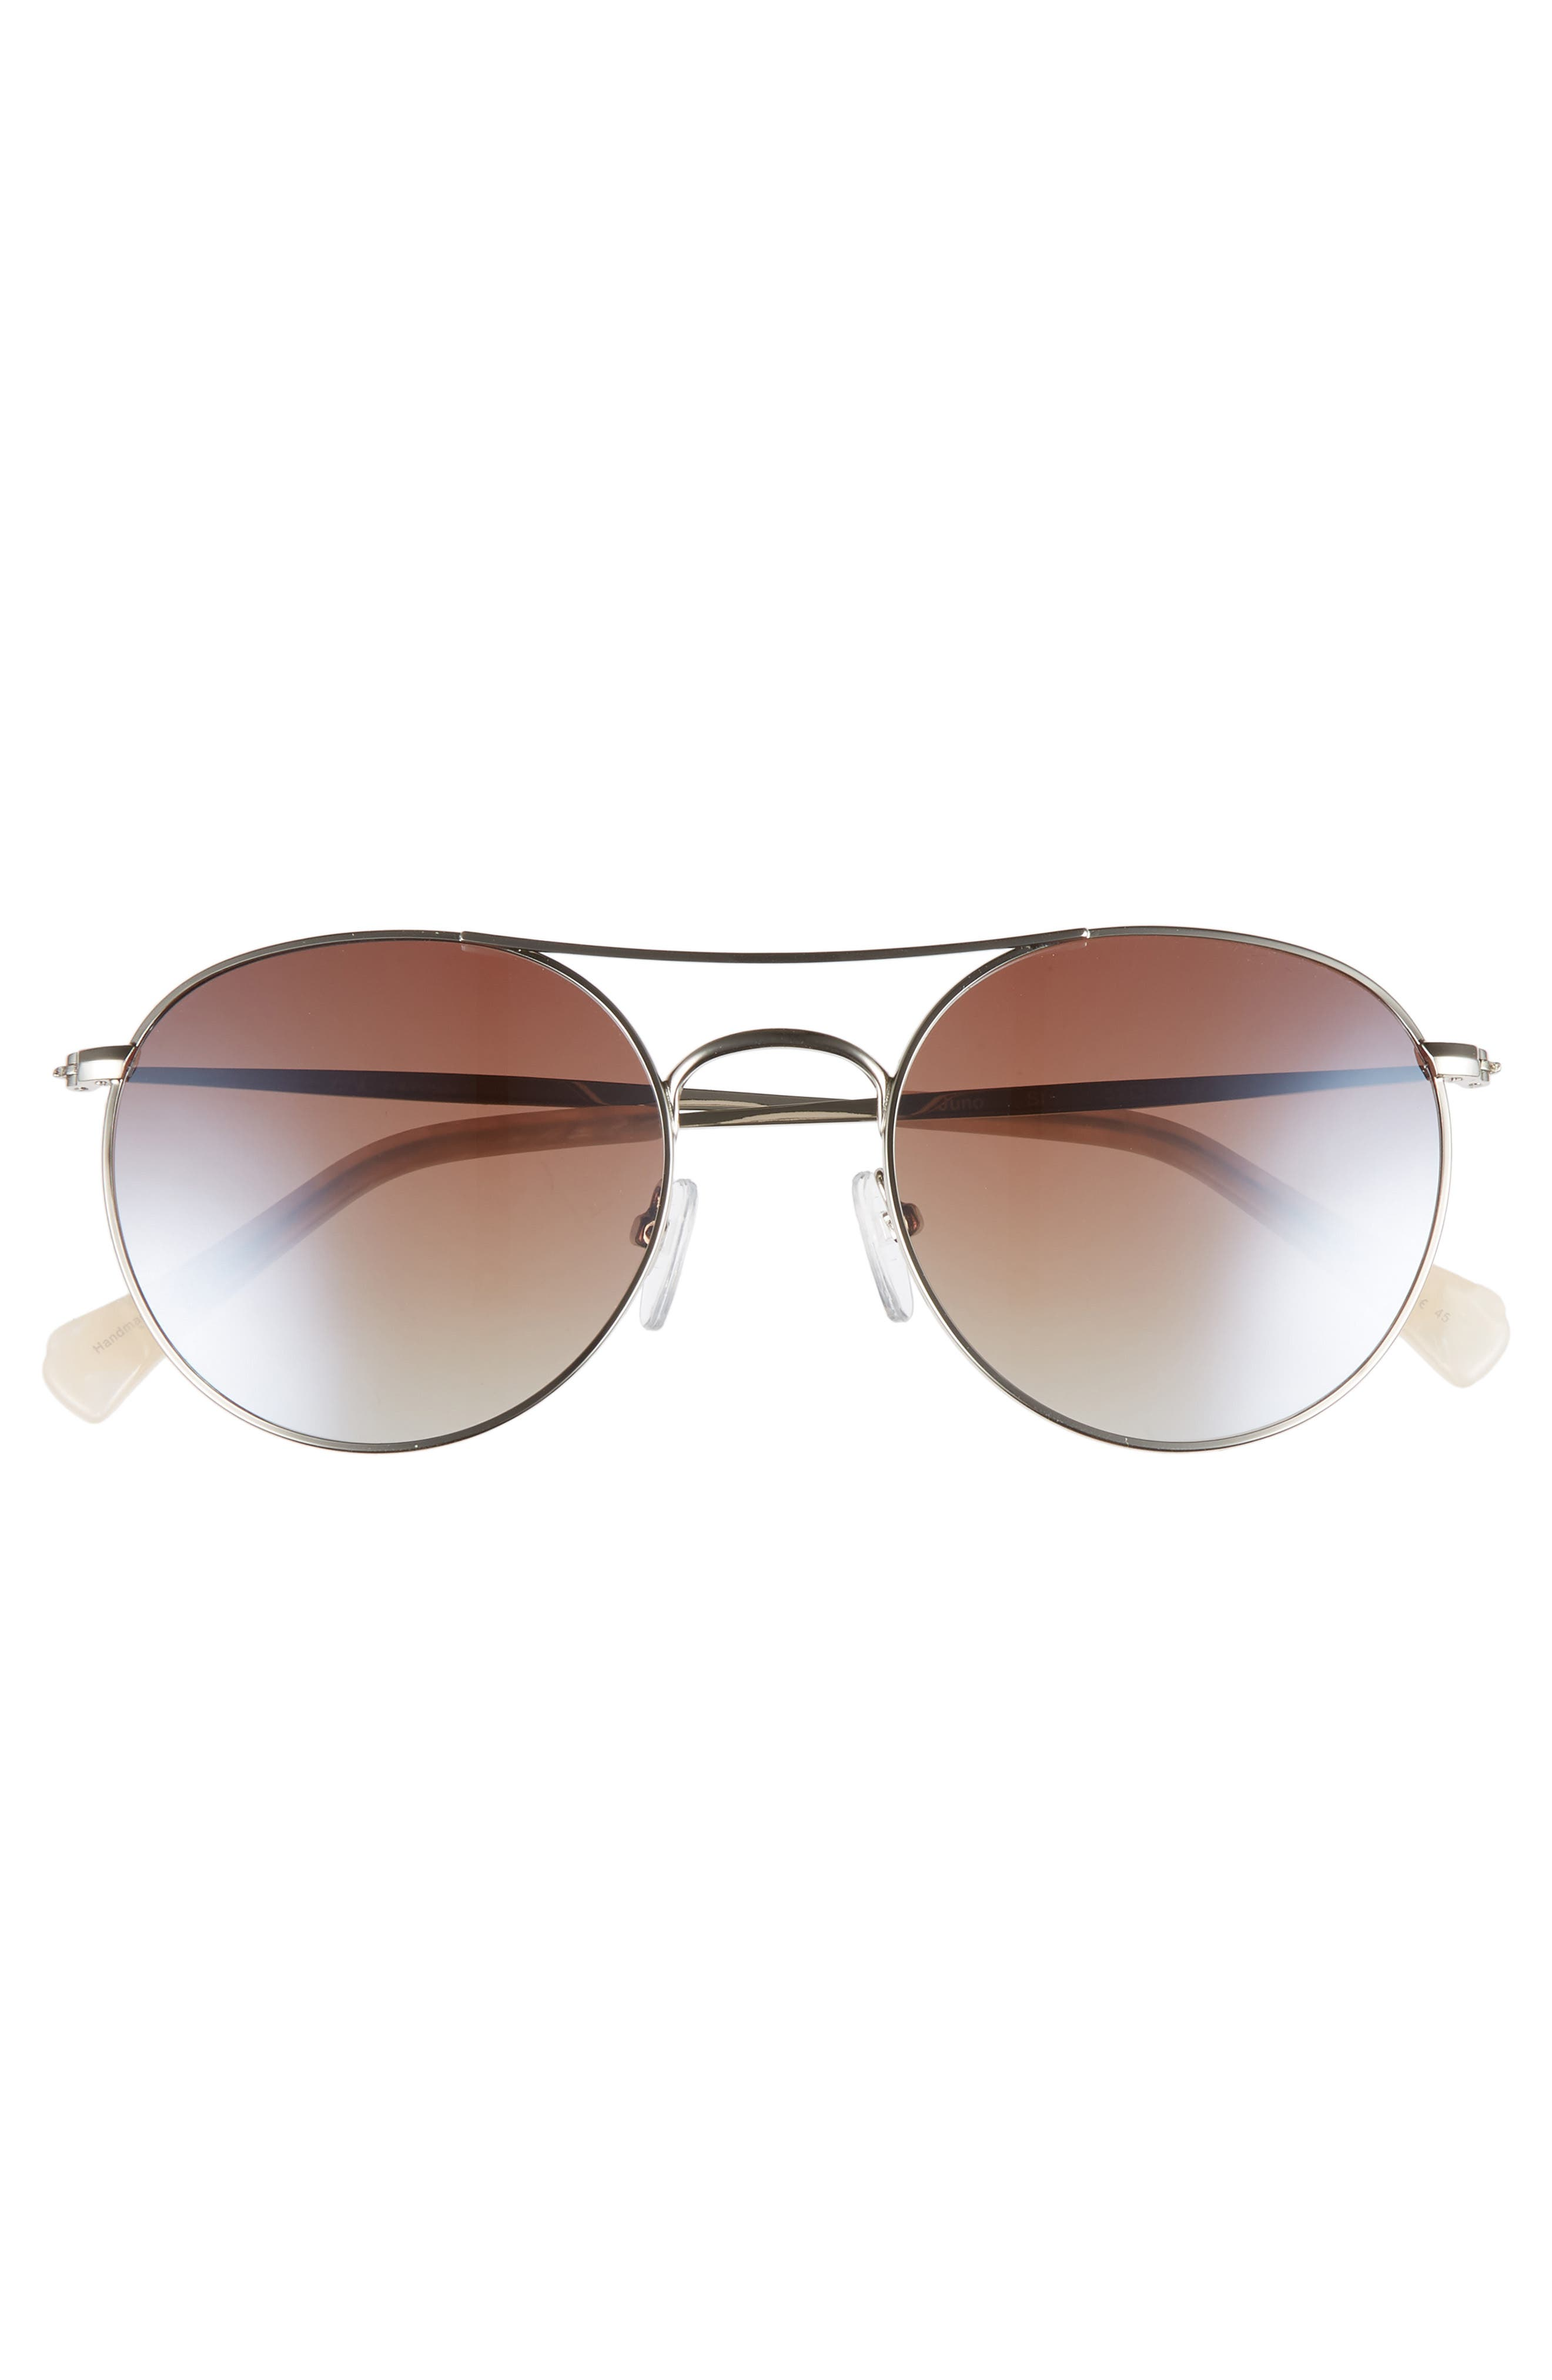 Juno 52mm Polarized Metal Aviator Sunglasses,                             Alternate thumbnail 3, color,                             SILVER POLAR/ BROWN